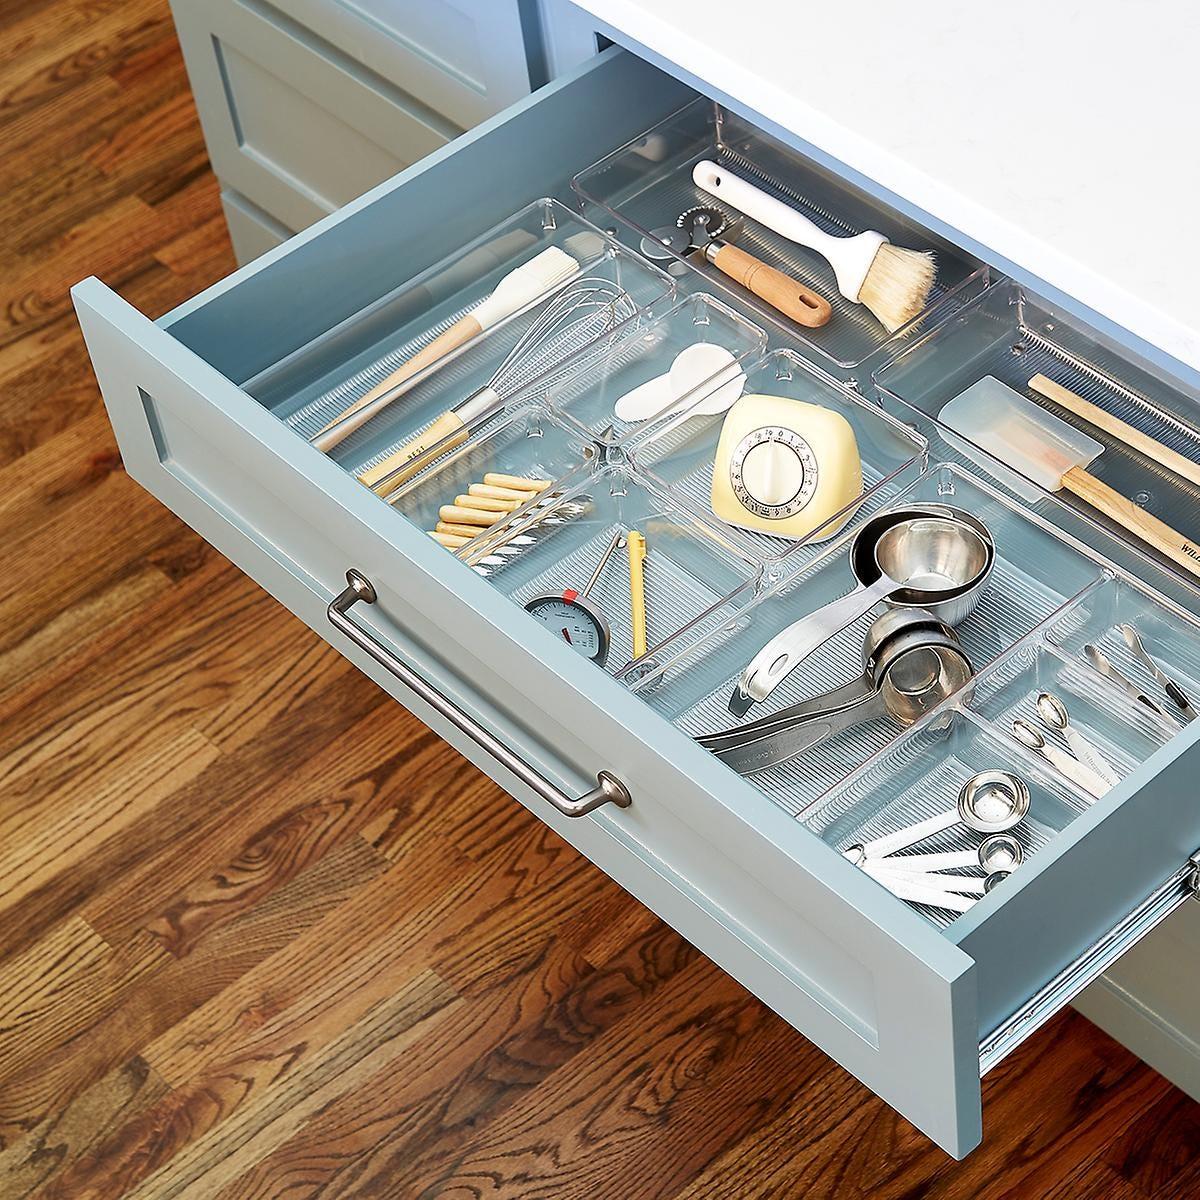 Best Gadgets For A Clean Kitchen, Organization